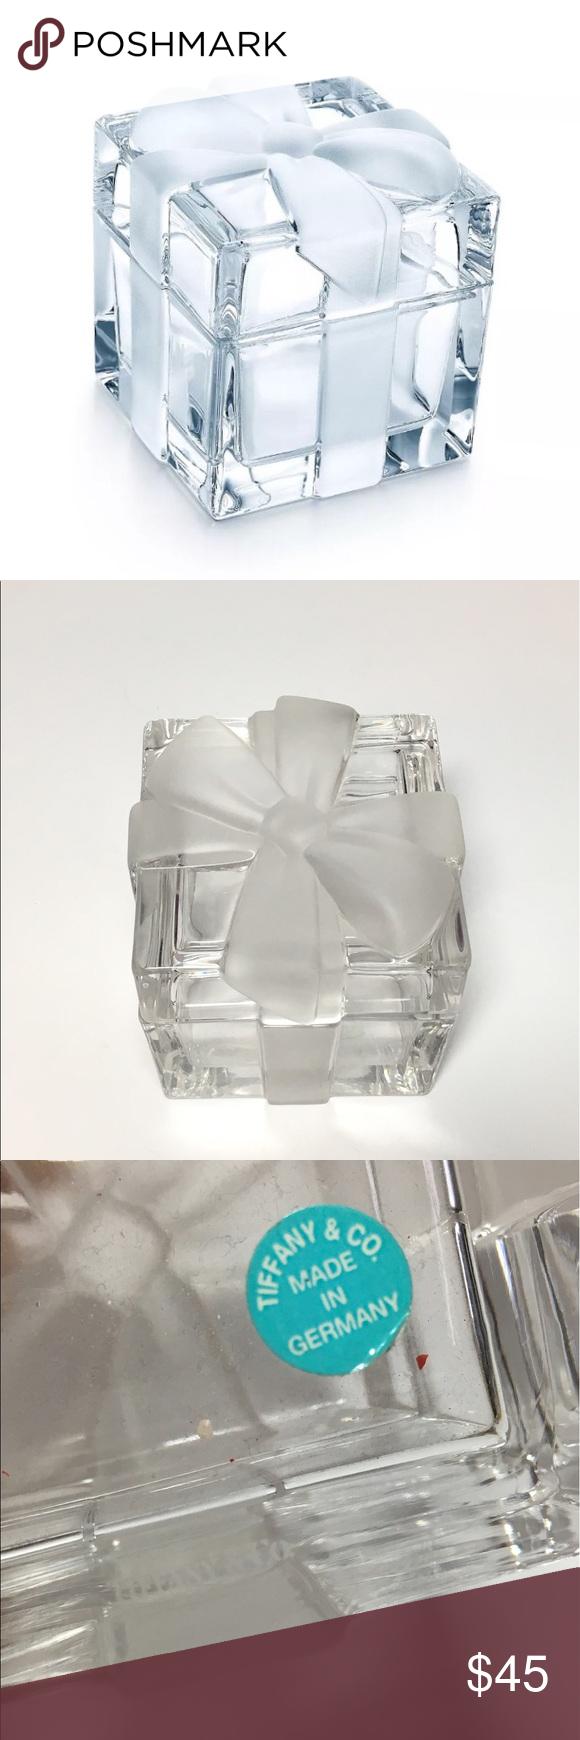 18++ Tiffany and co glass jewelry box ideas